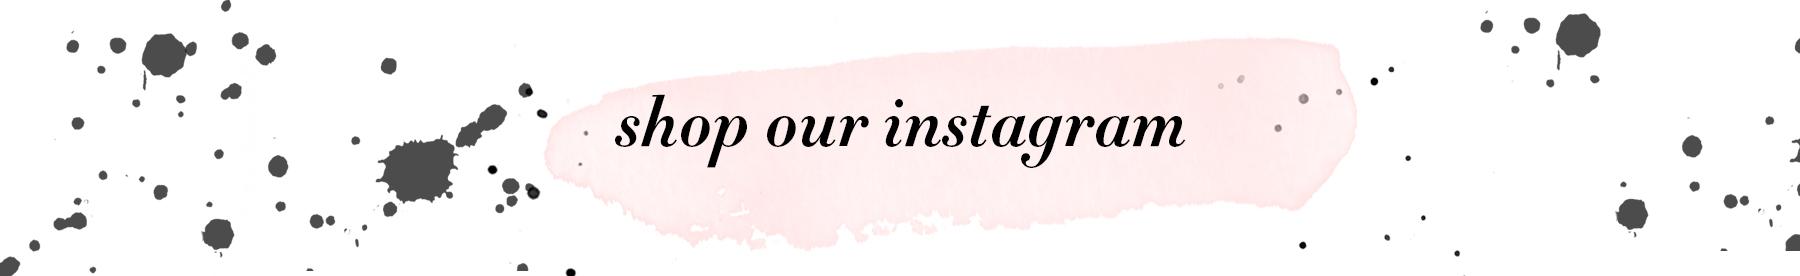 shop-our-instagram.jpg